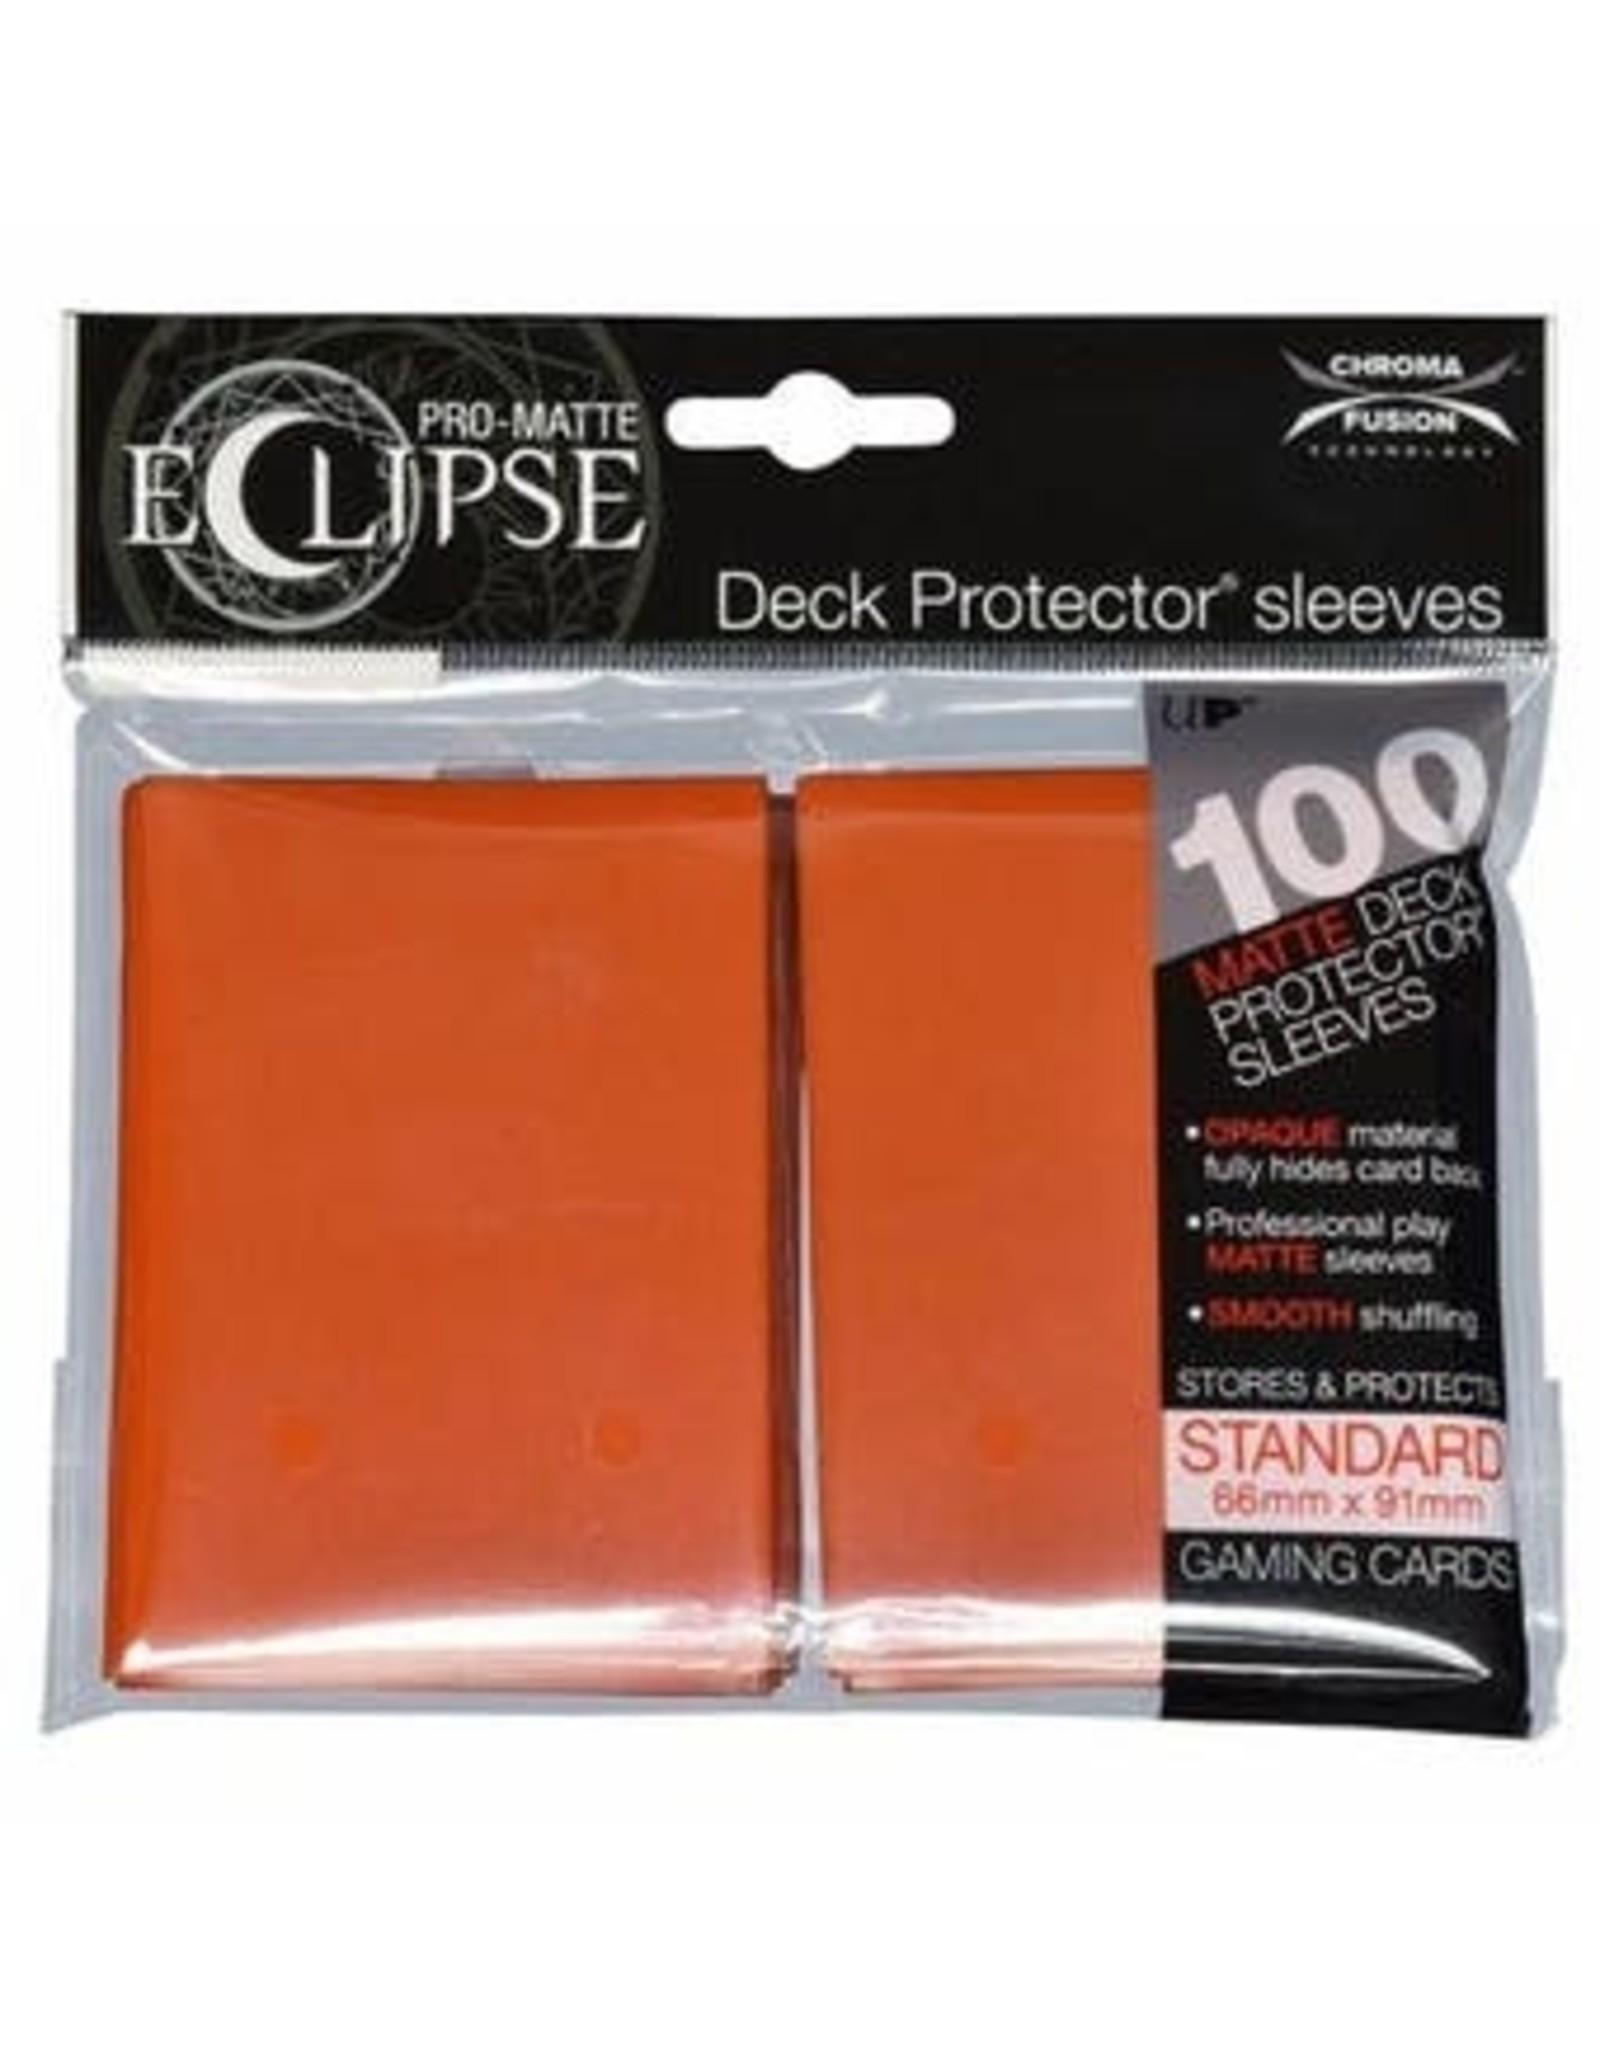 Pro-Matte Eclipse 2.0 Standard Deck Protector Sleeves: Pumpkin Orange (100)